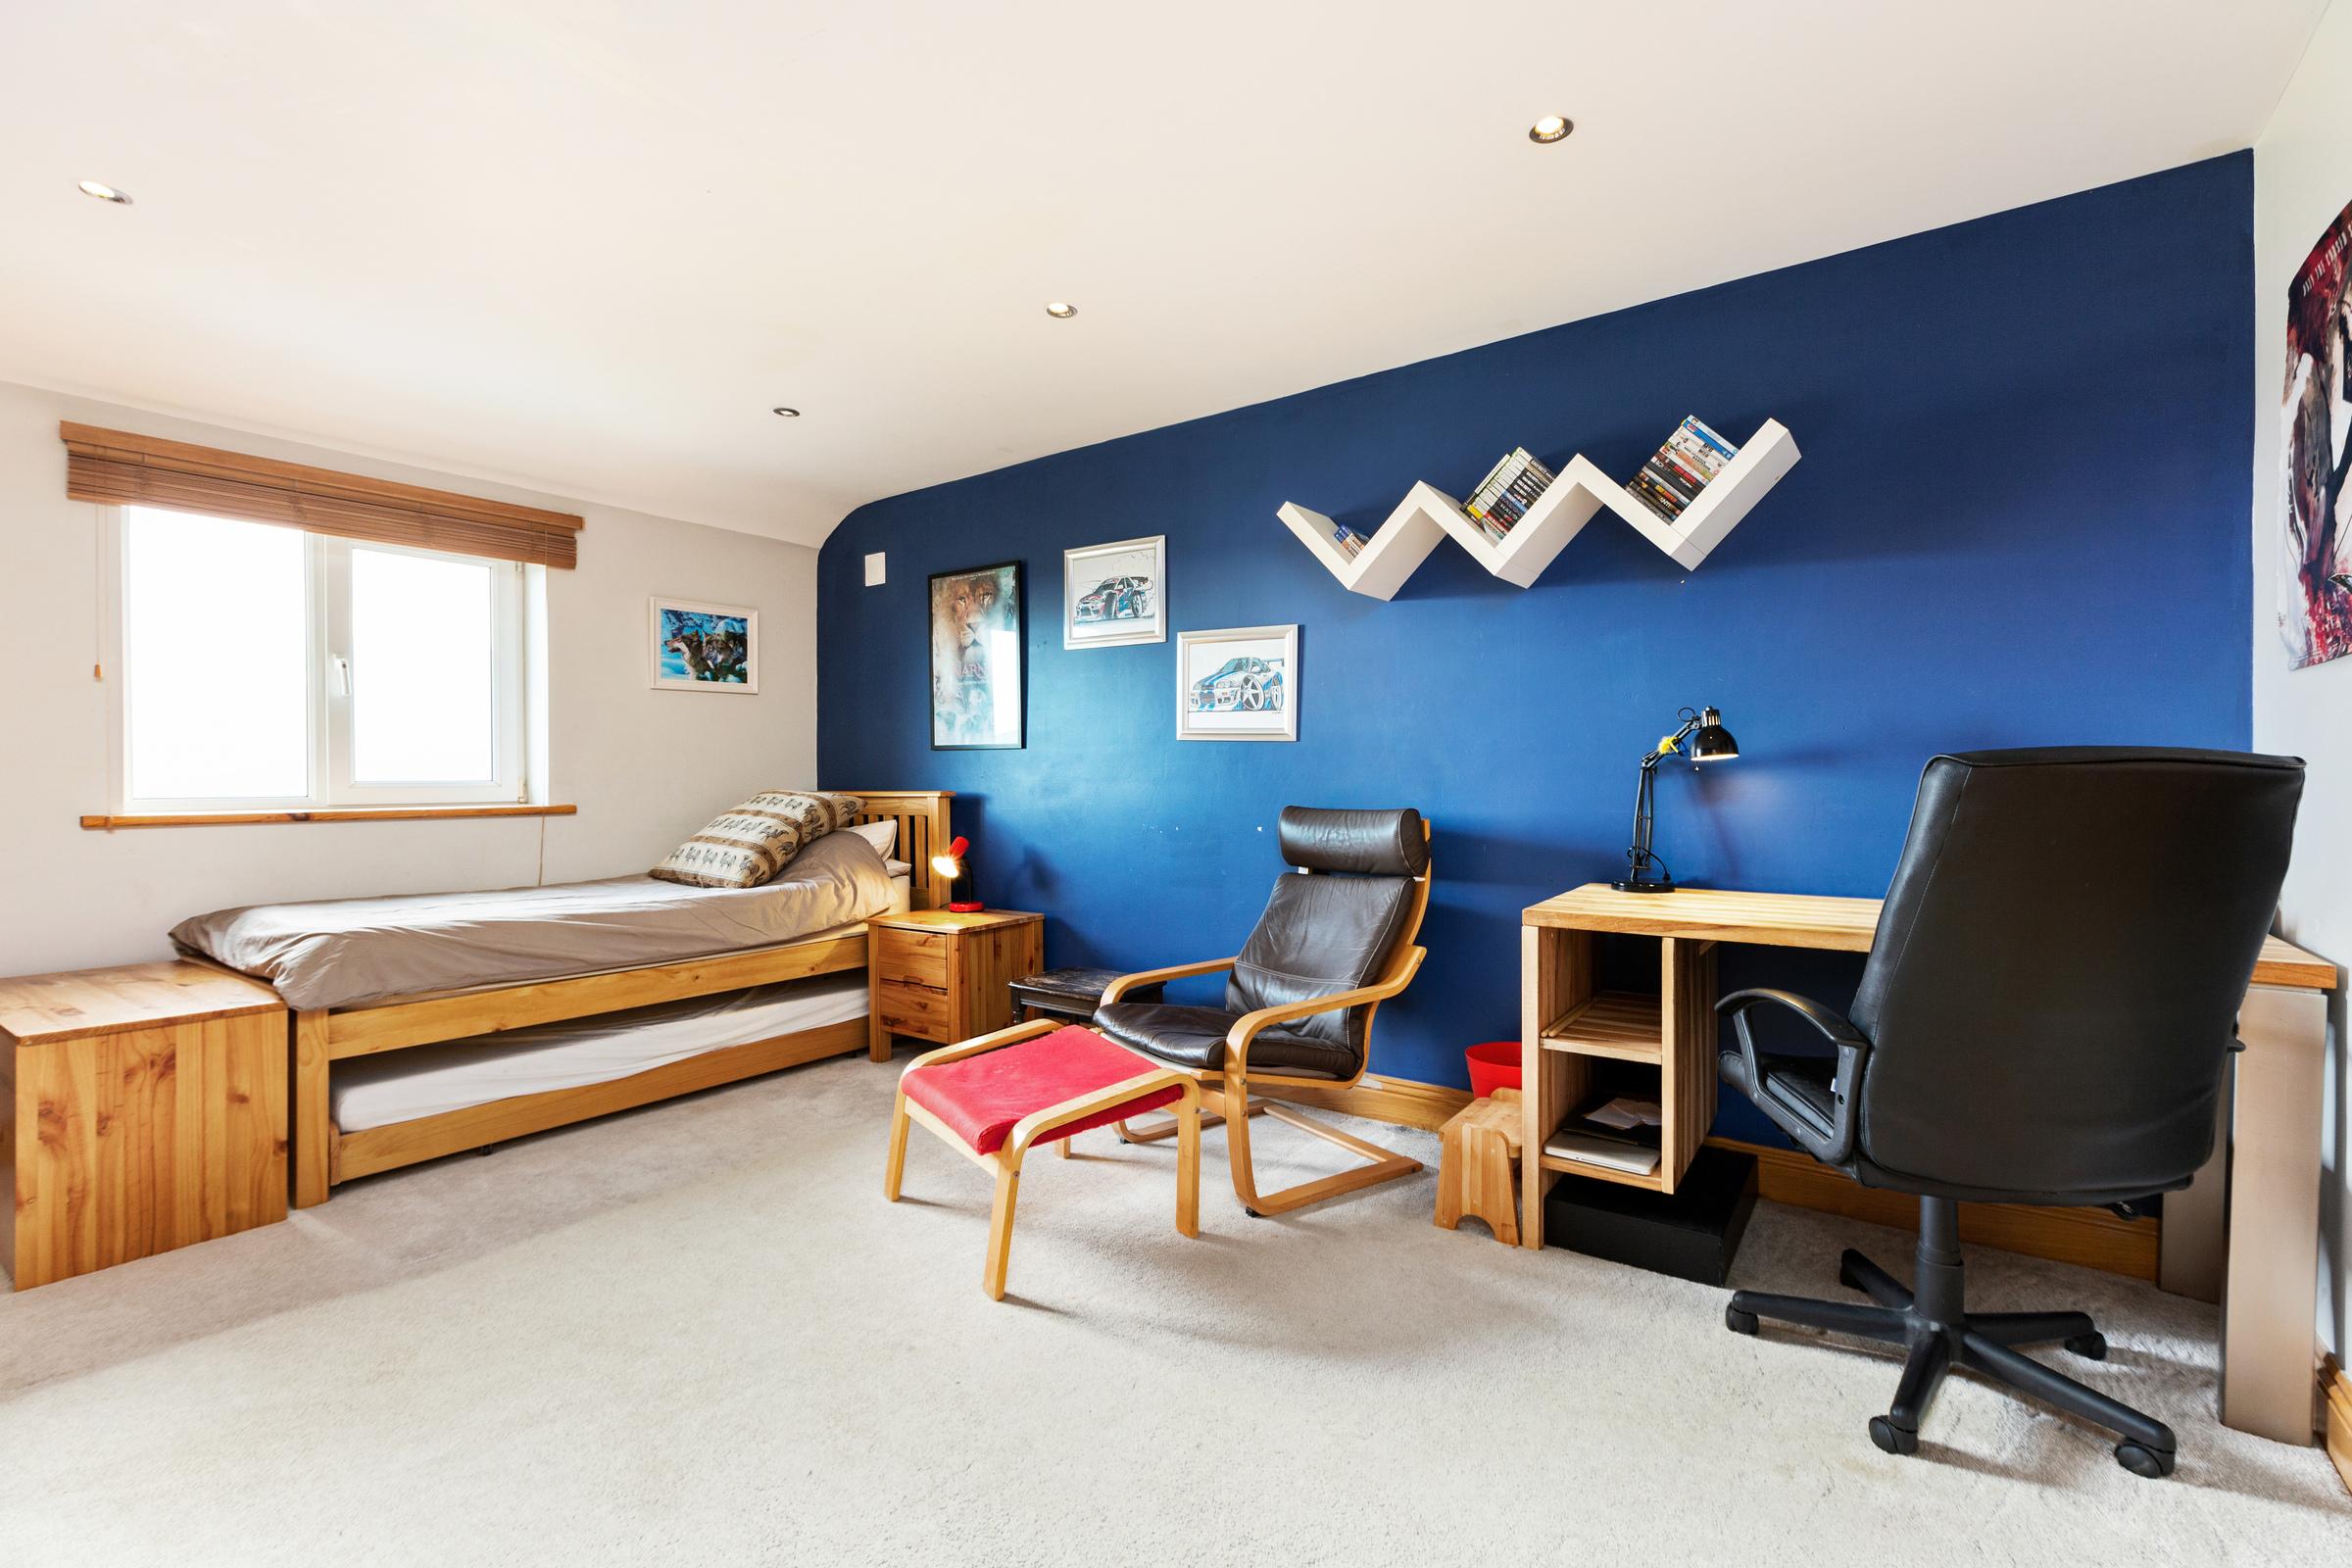 Viking Lodge, Ballyhack, New Ross, Co. Wexford